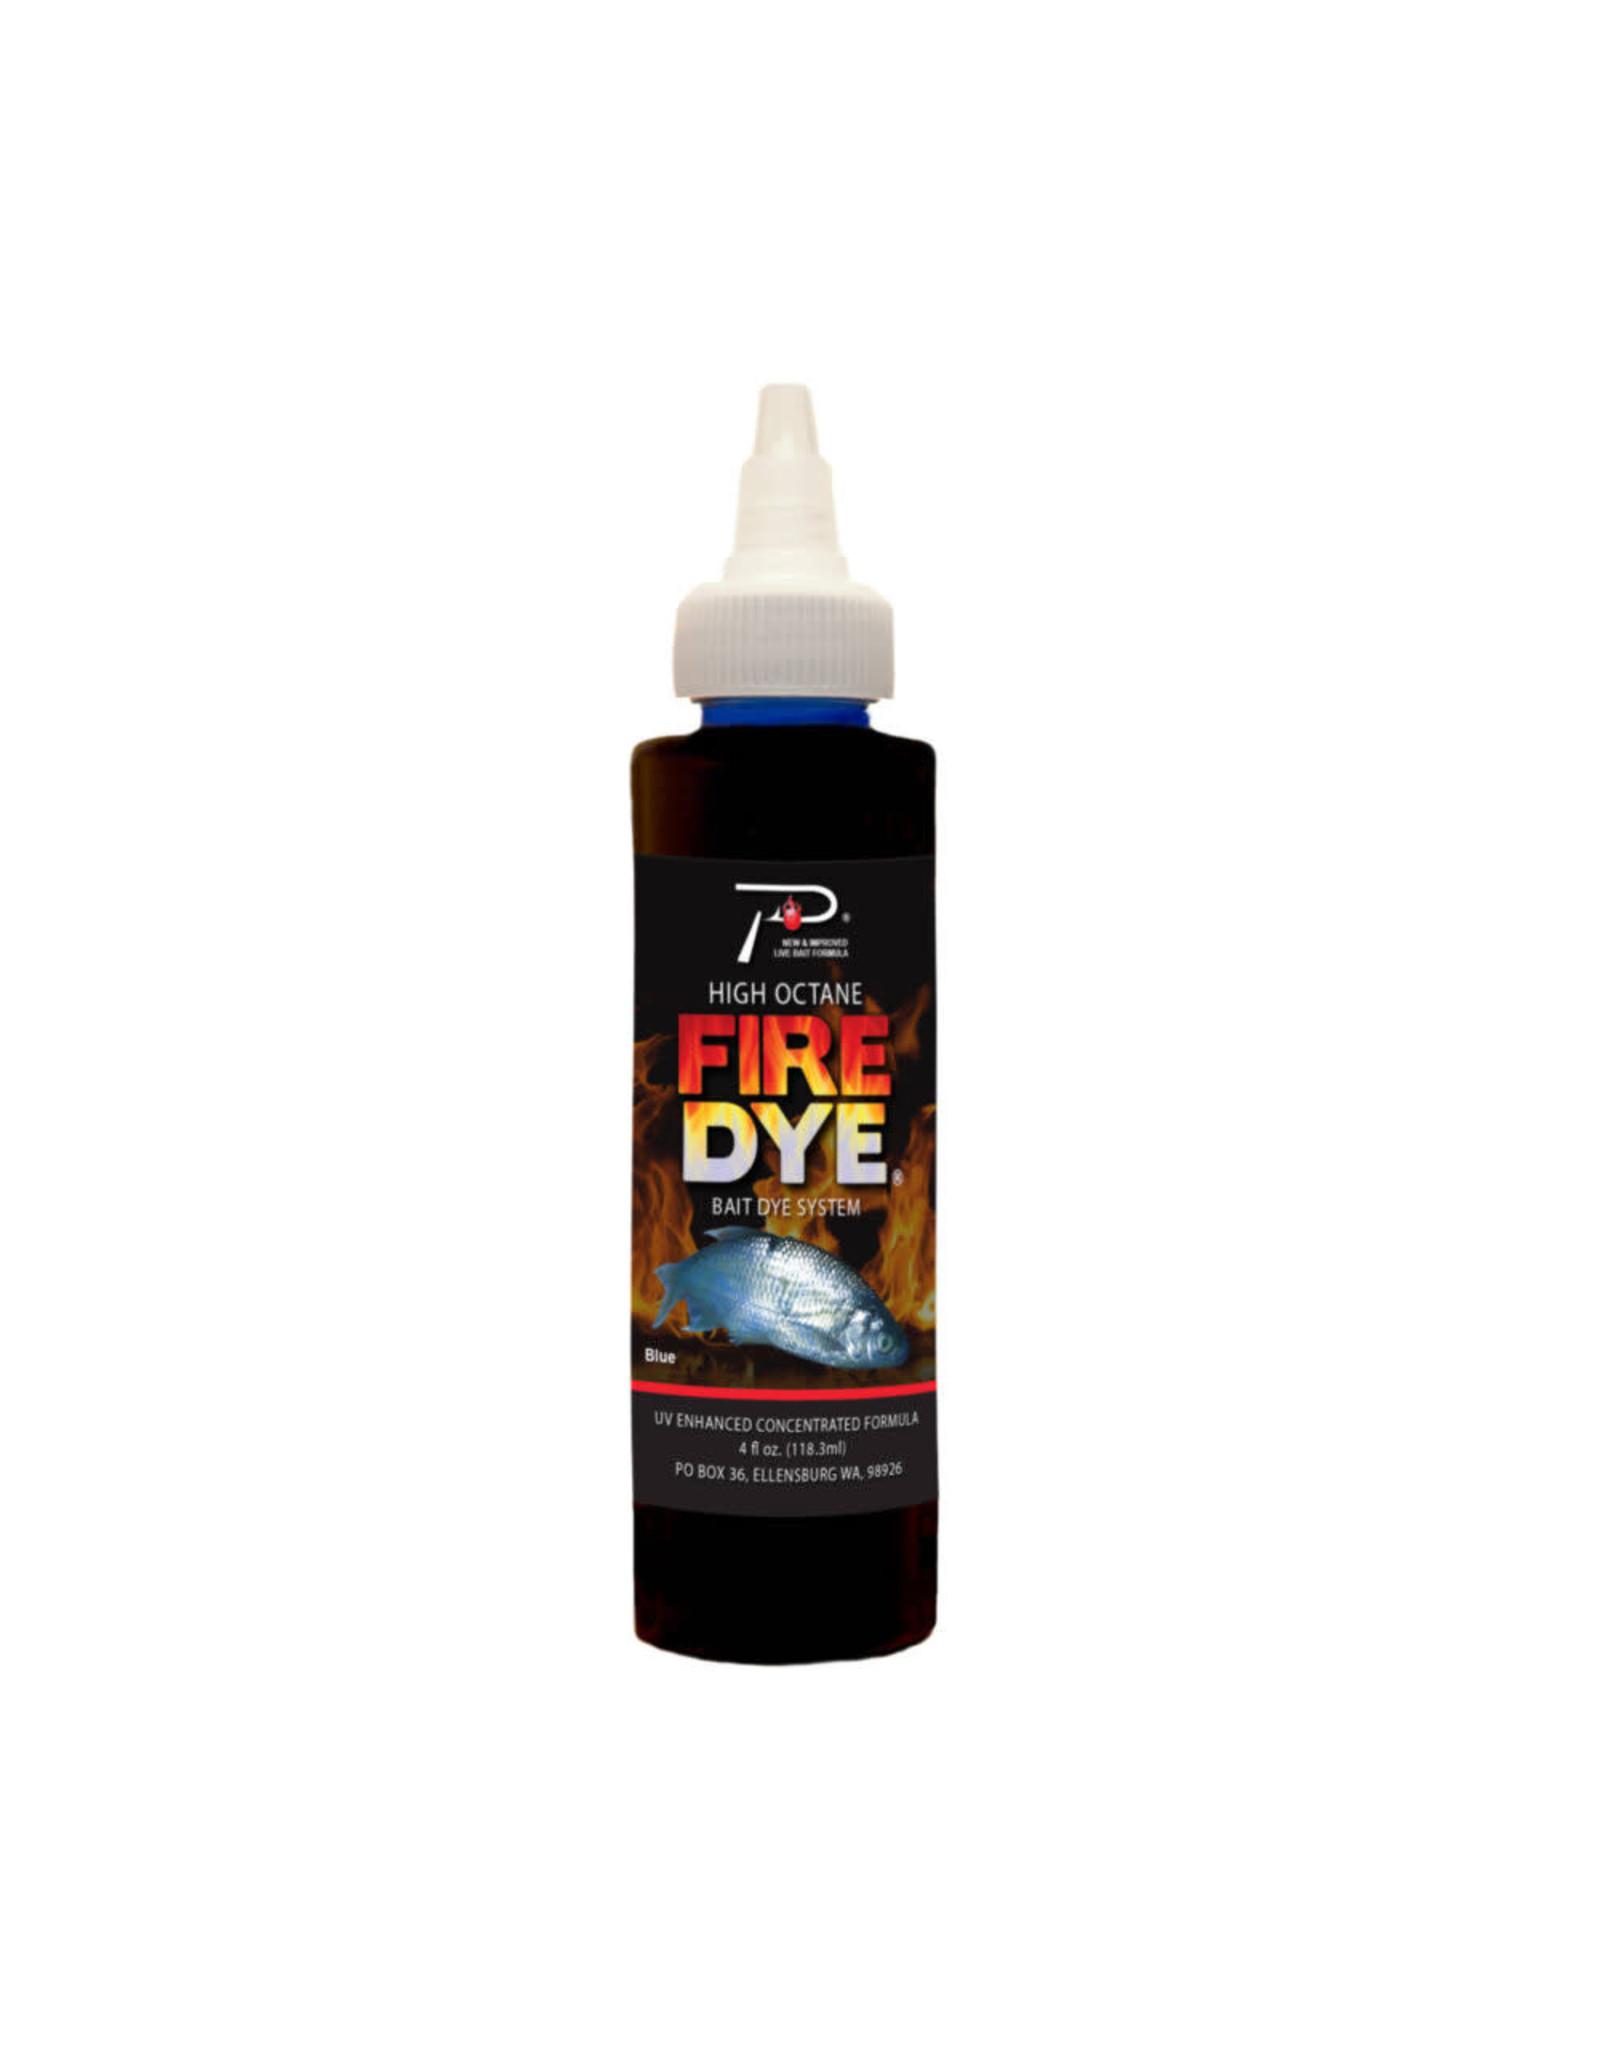 Pautzke Pautzke's High Octane Fire Dye Bait Dye System